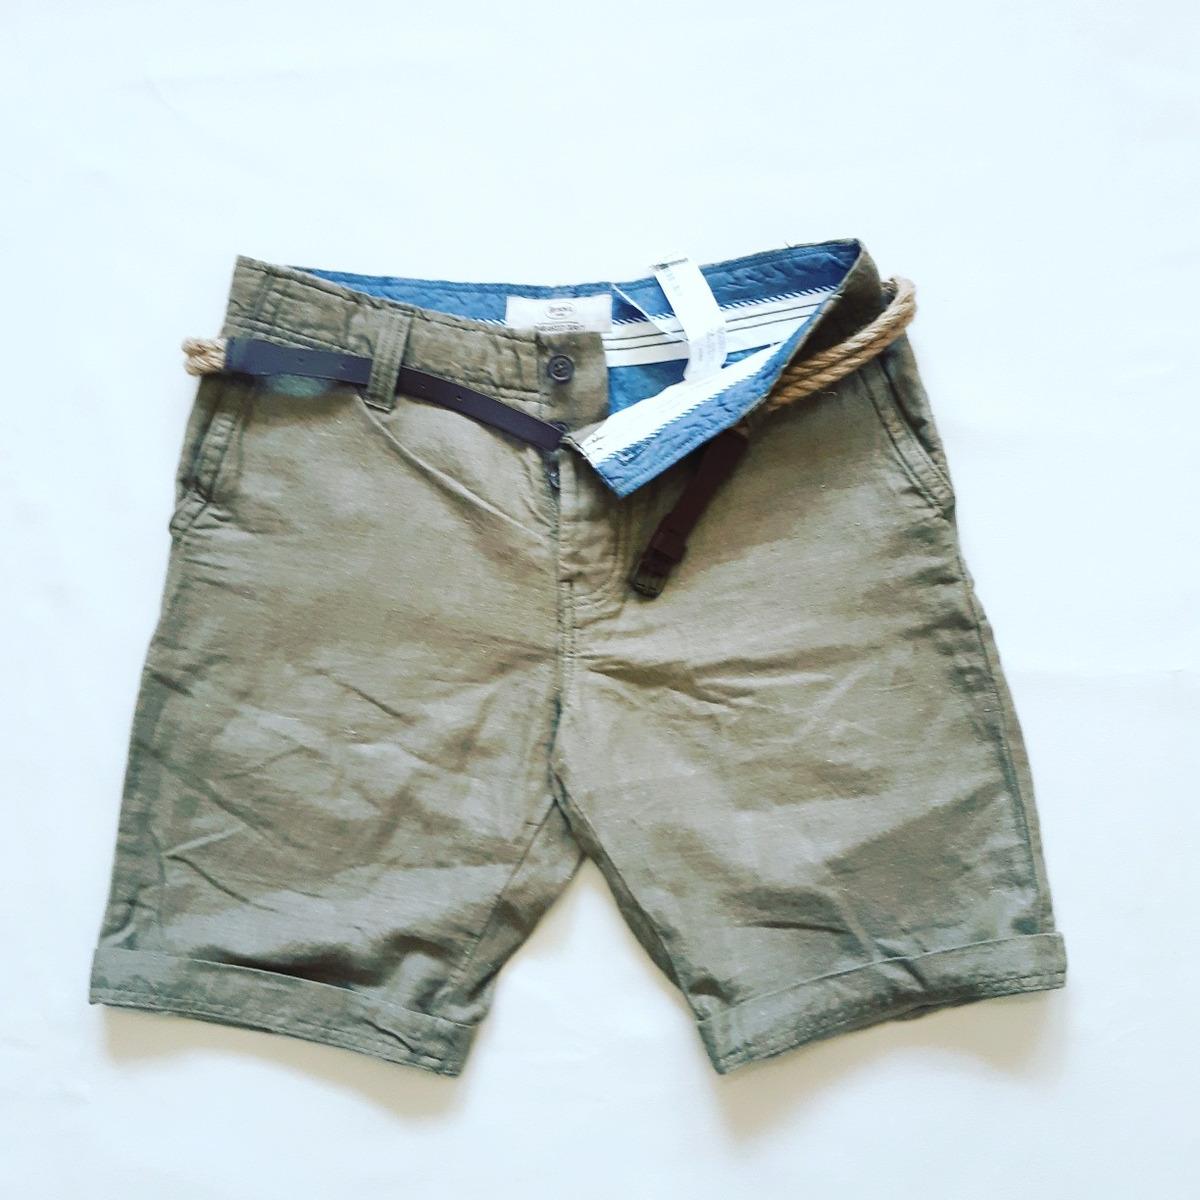 c01944556dc3 Short Tela Bershka+cinto De Regalo !! - $ 450,00